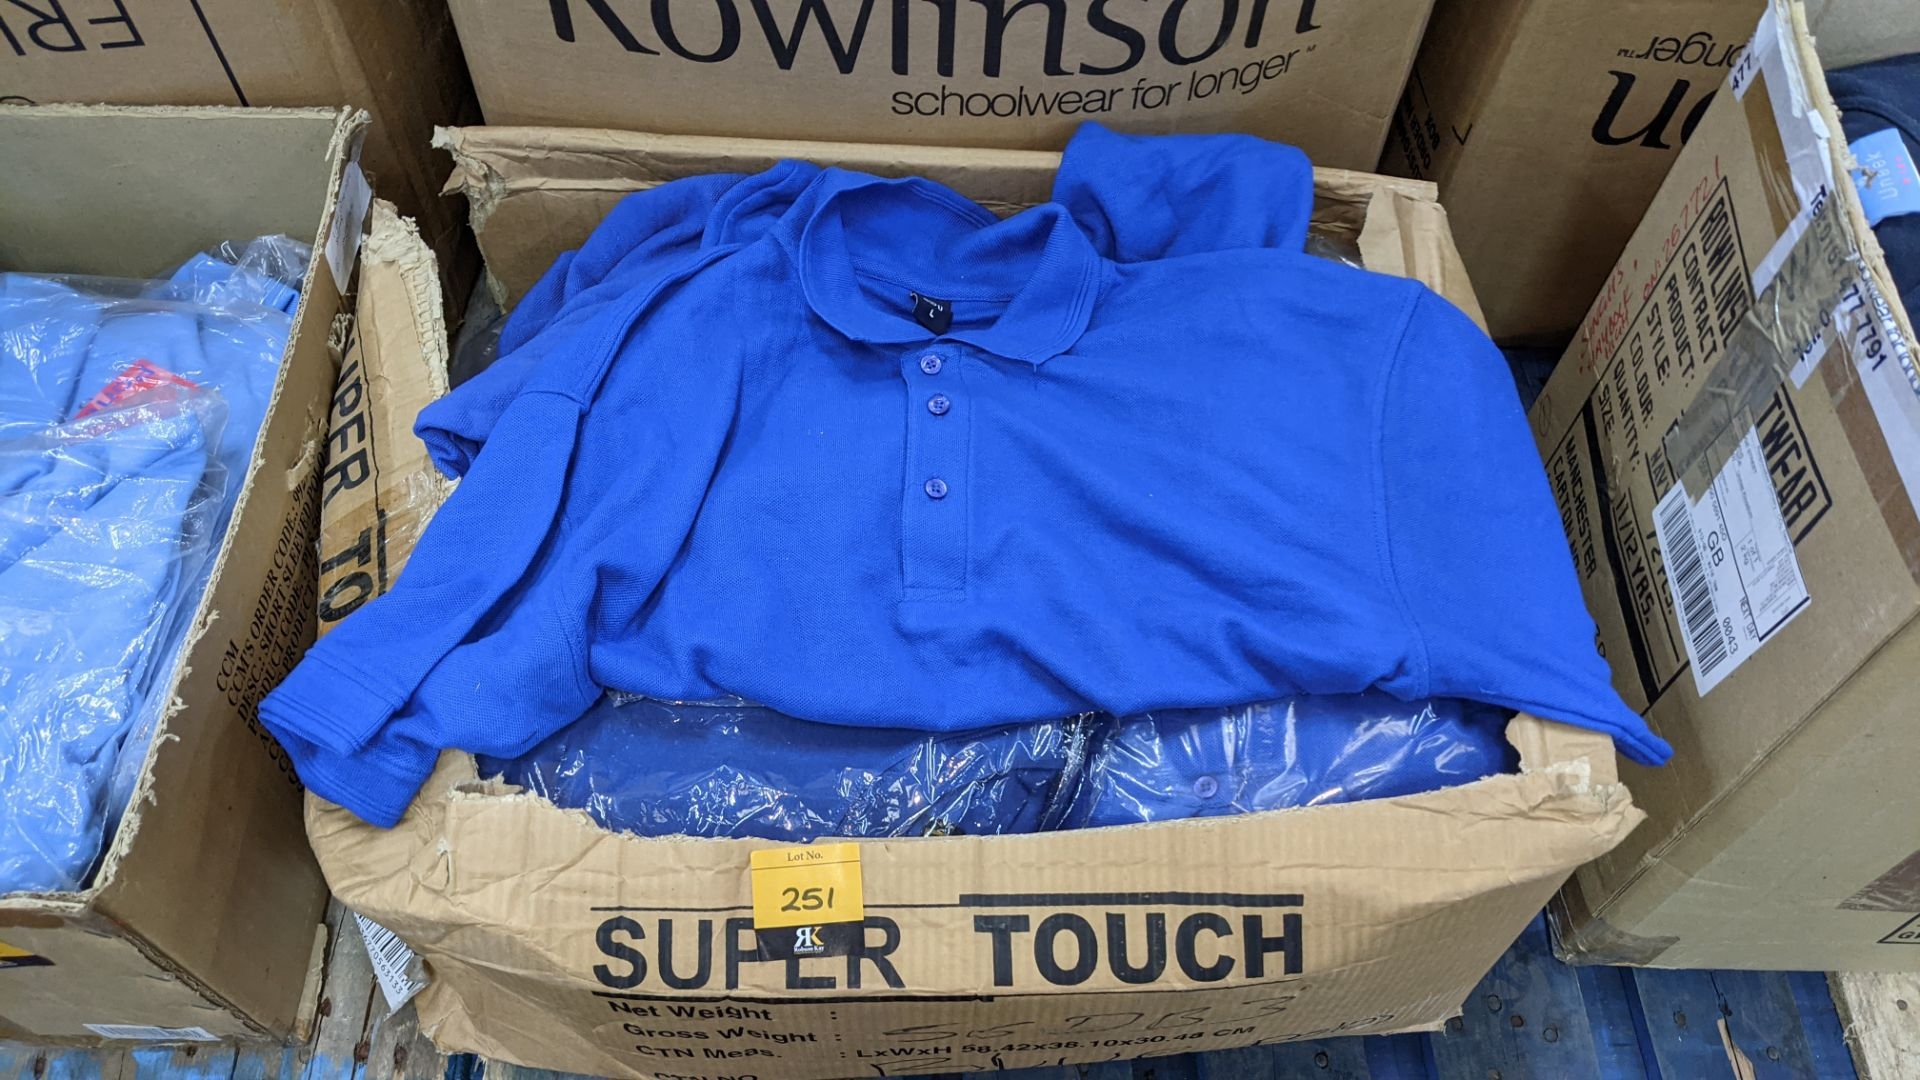 Quantity of royal blue polo shirts - 1 box - Image 3 of 4